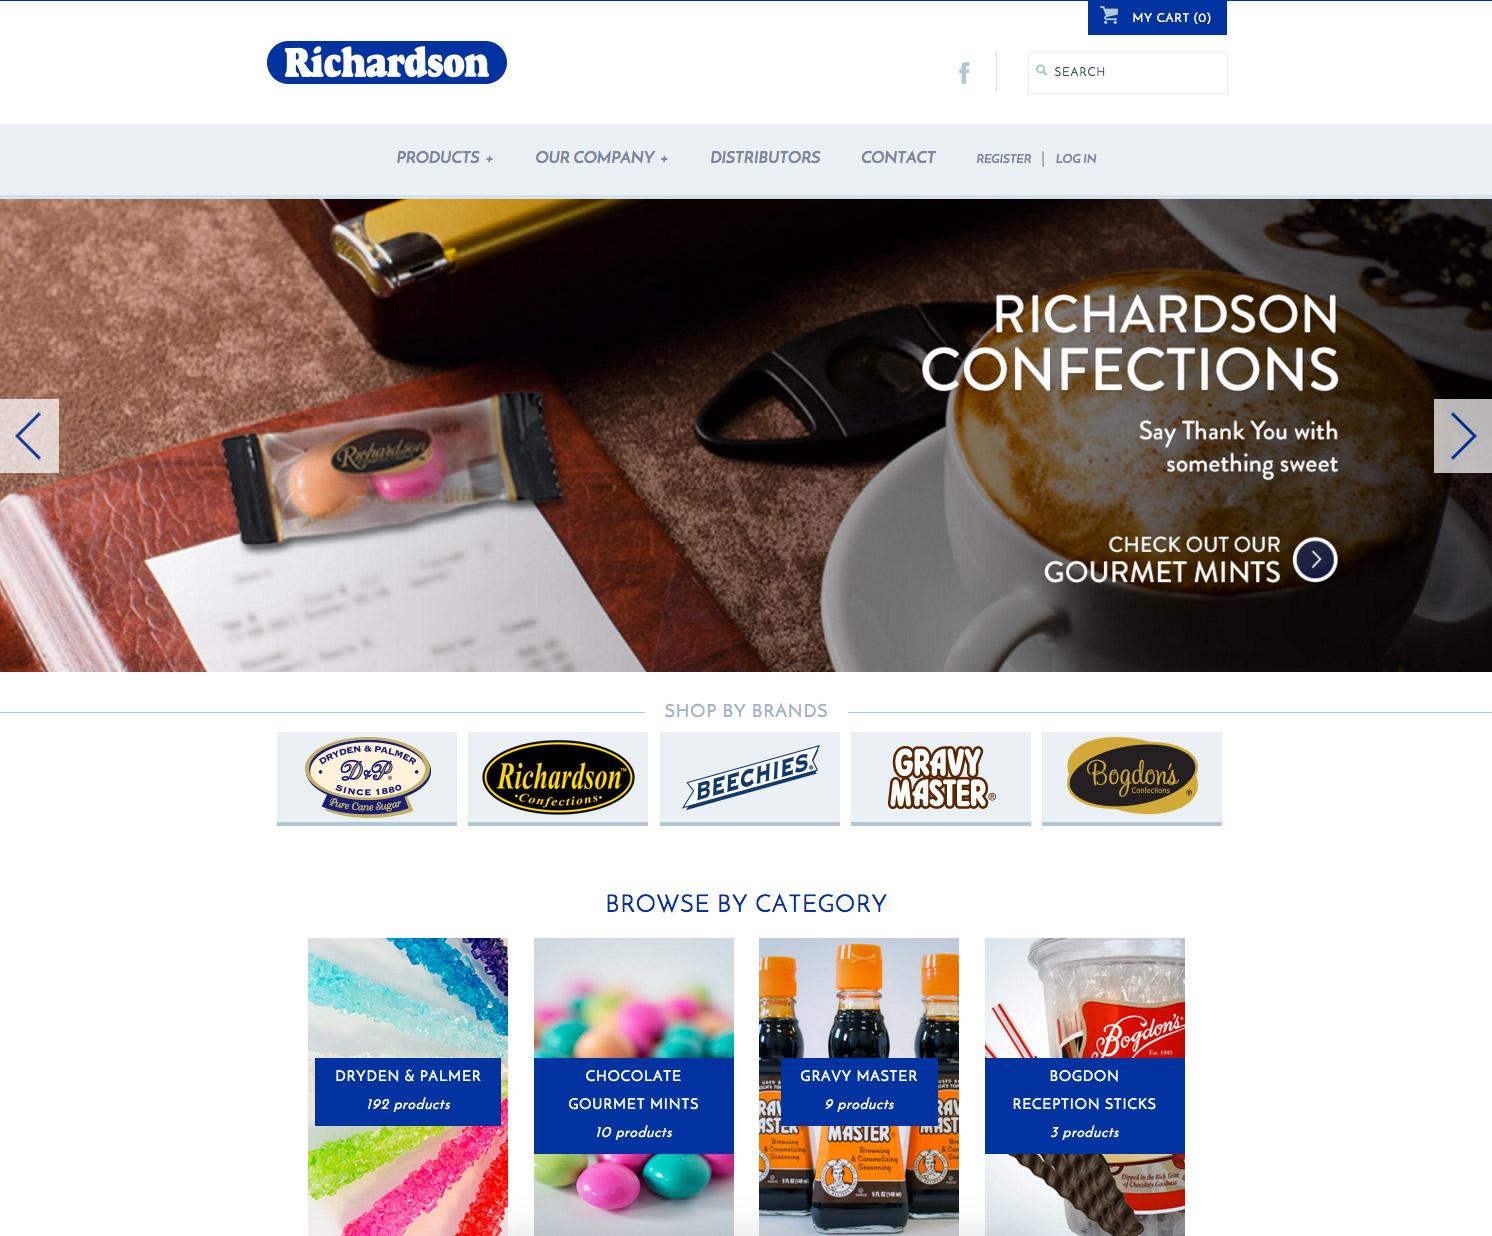 richardson-3.jpg